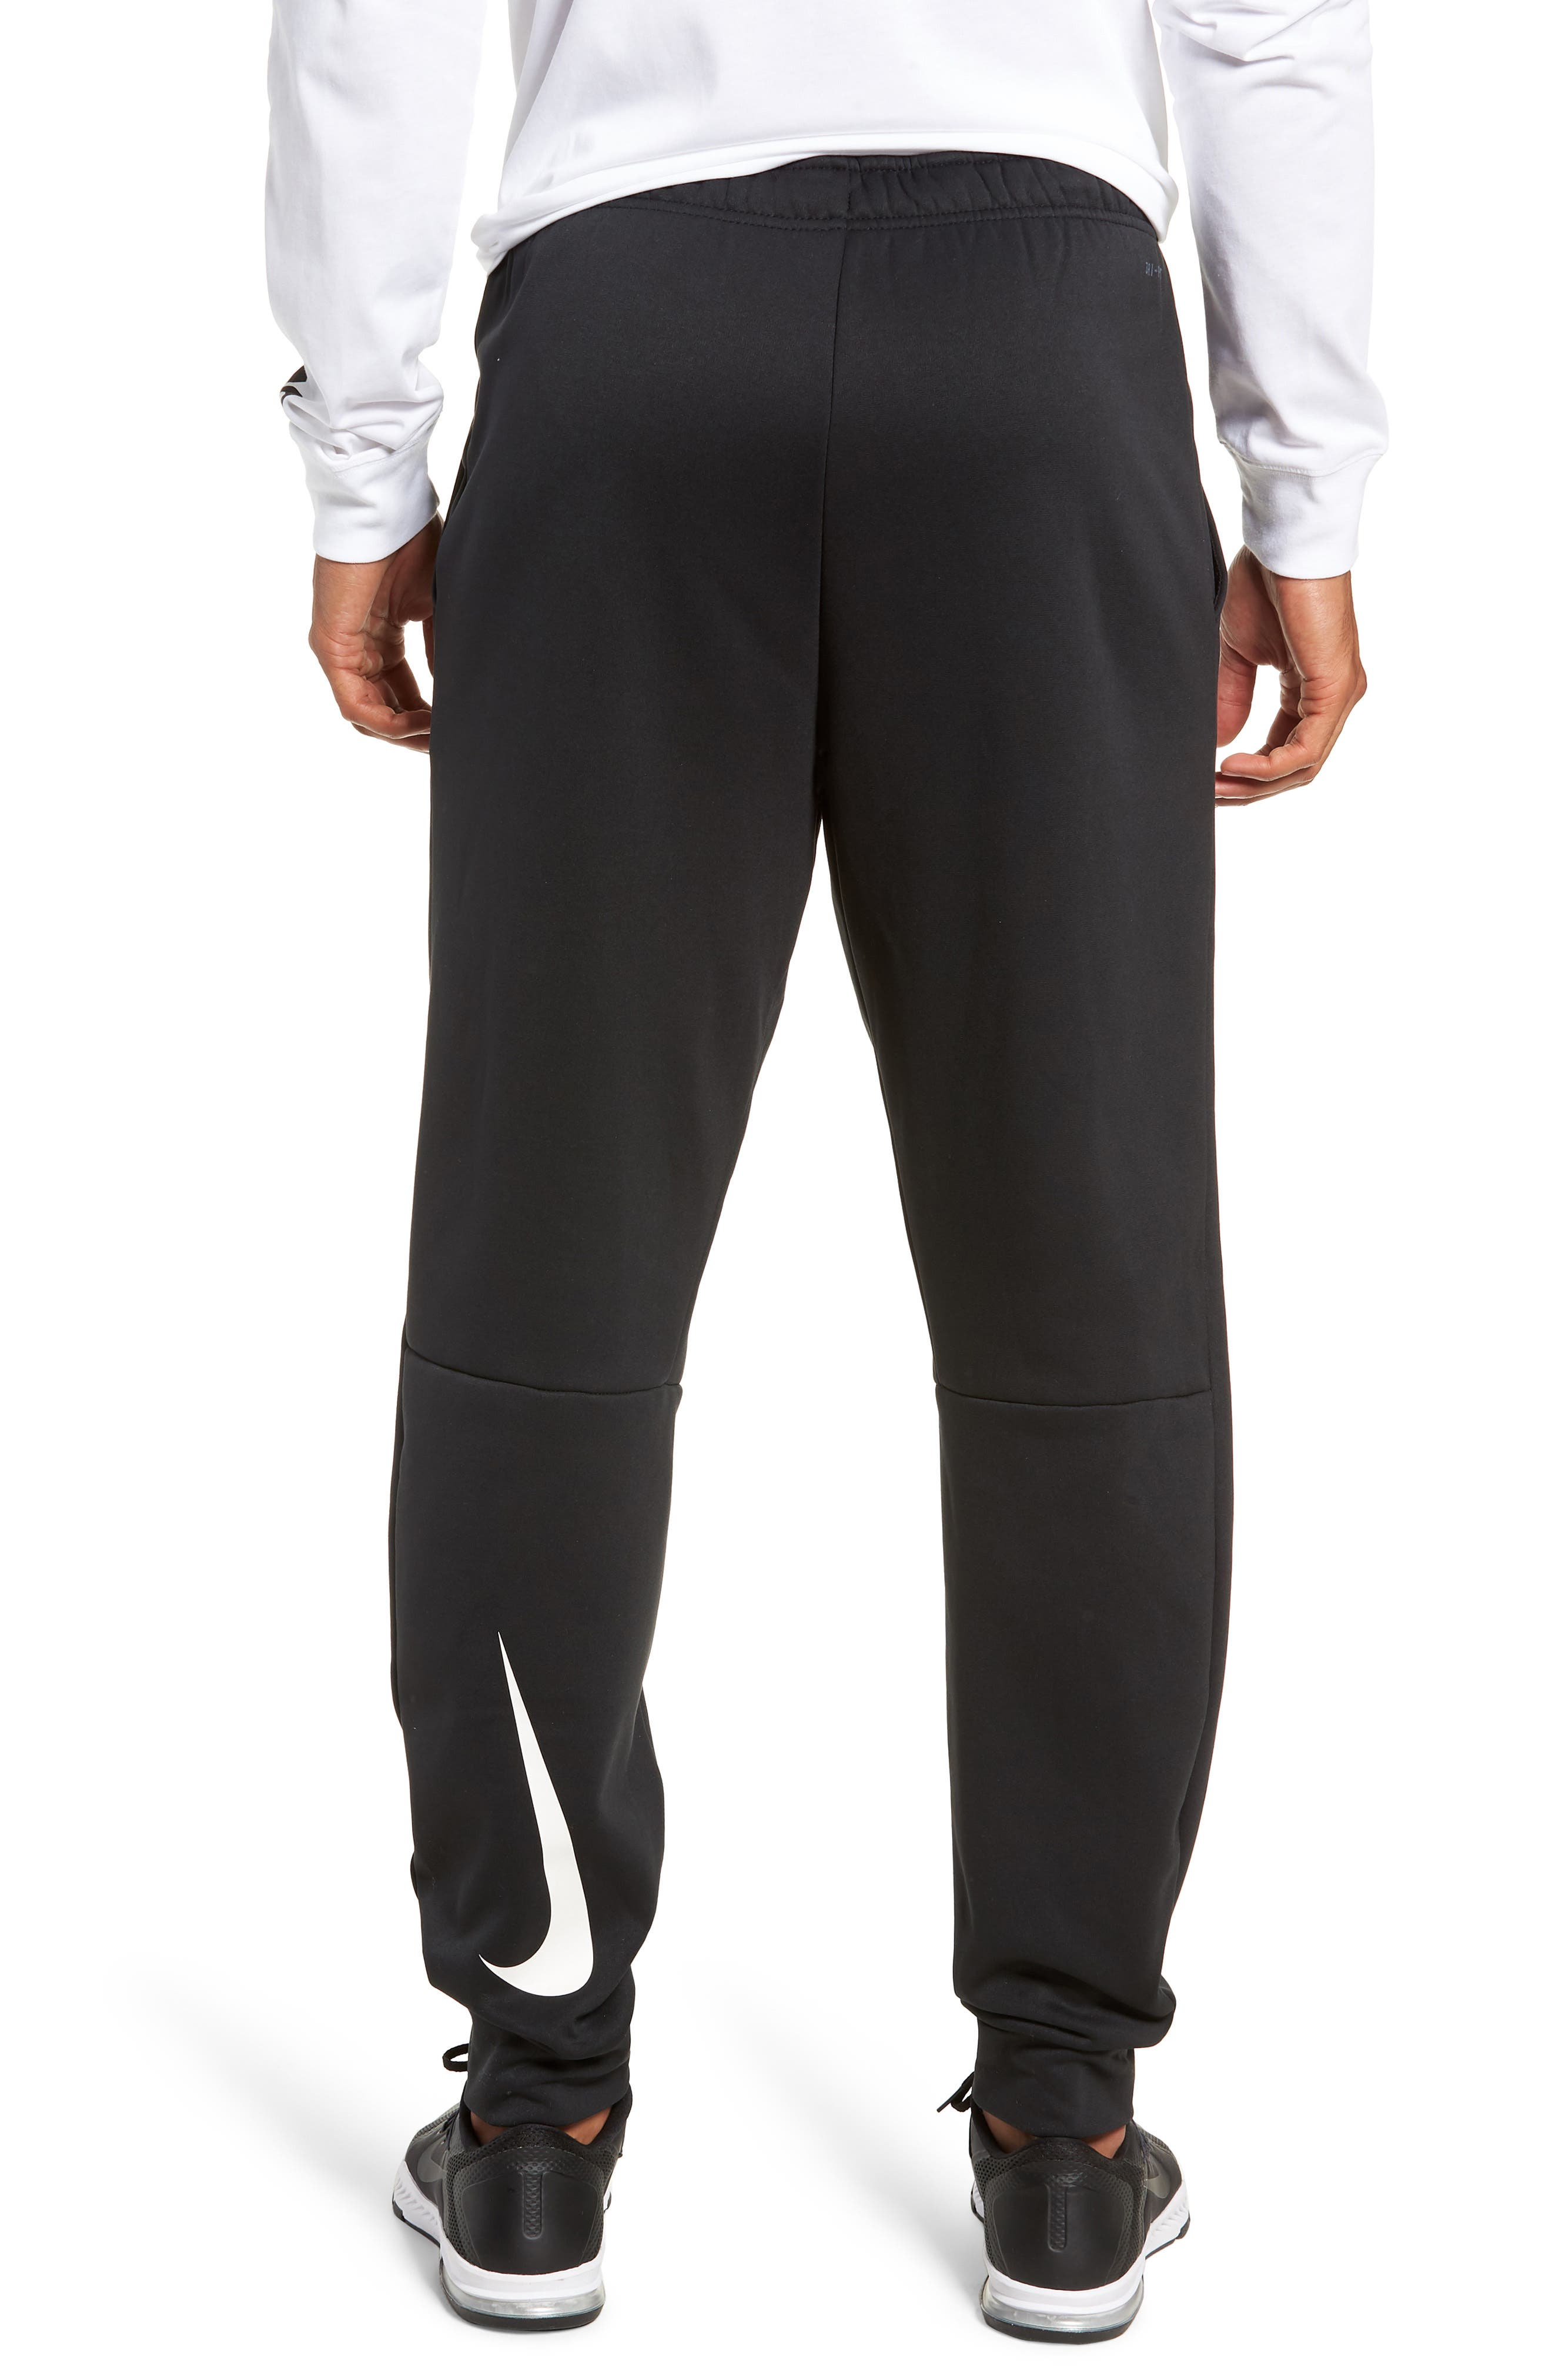 Therma Tapered Pants,                             Alternate thumbnail 2, color,                             BLACK/ WHITE